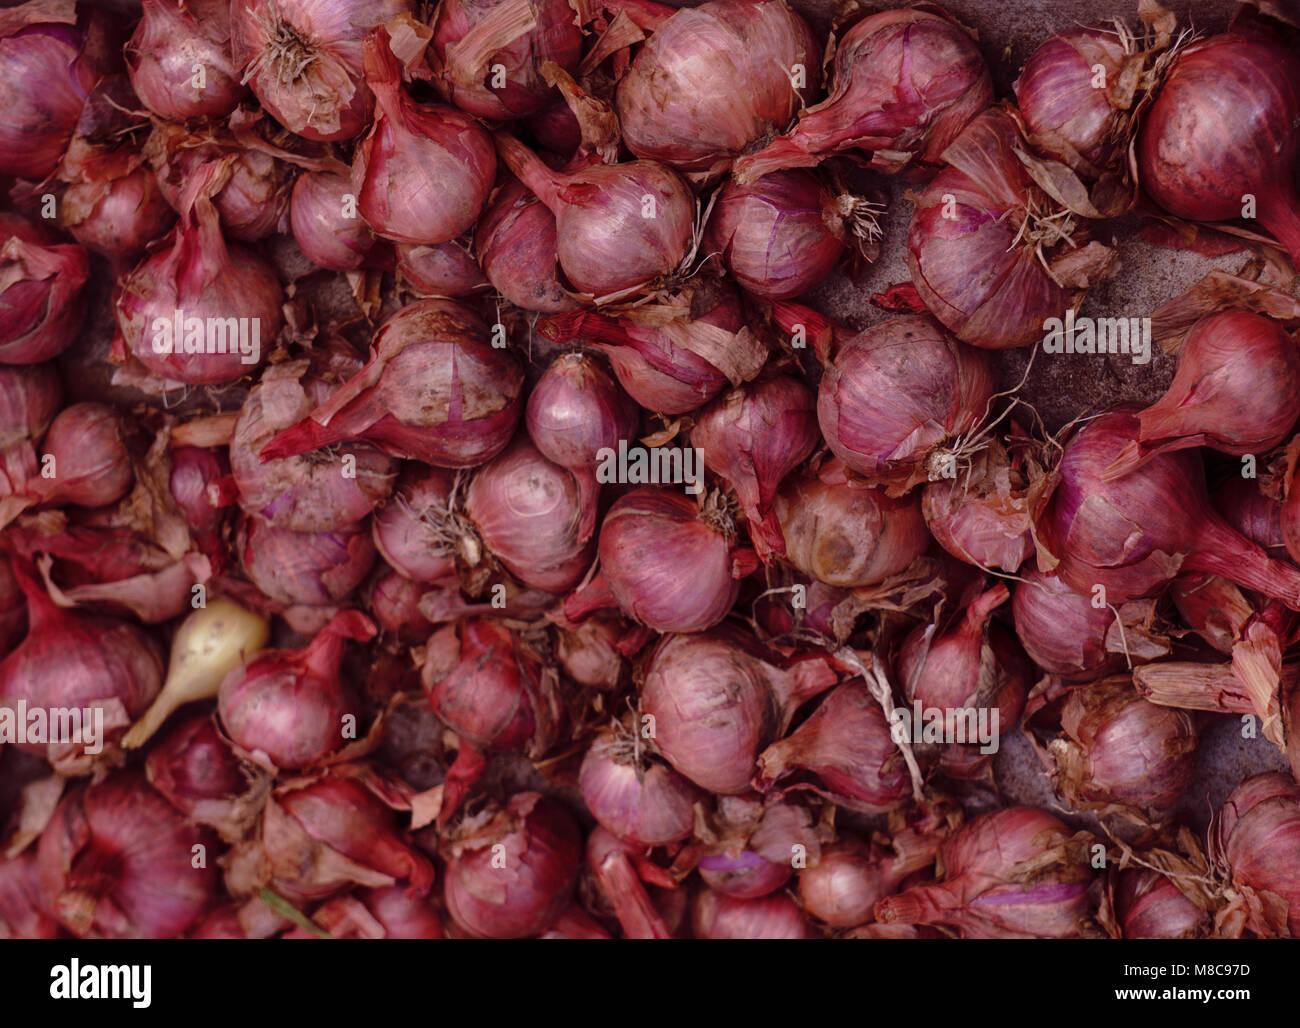 Red onions in plenty - Stock Image